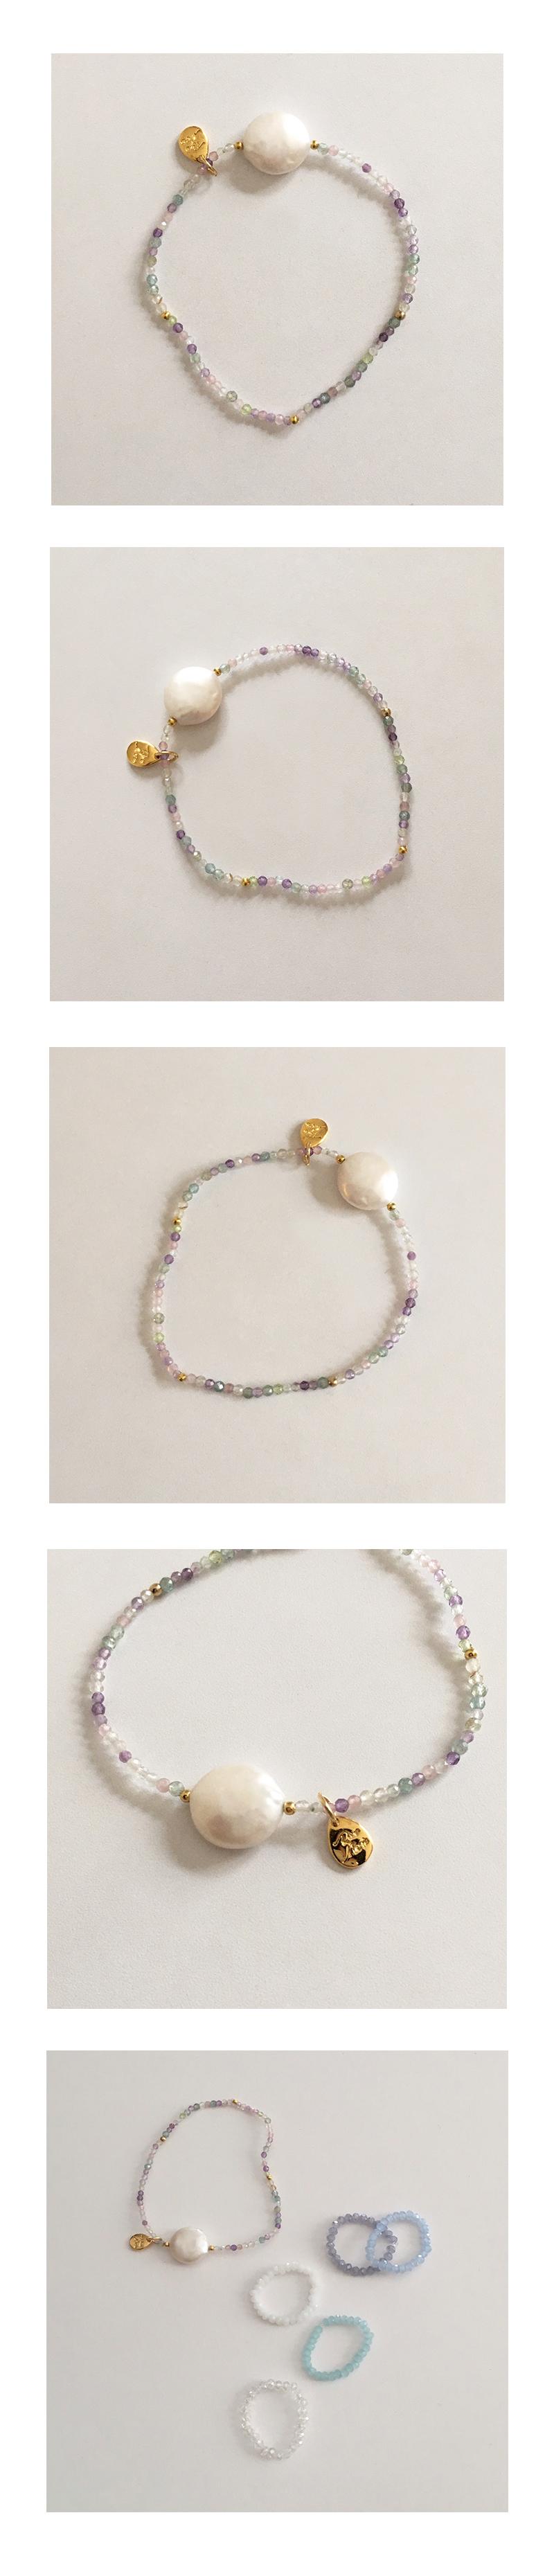 pearl sea bracelet